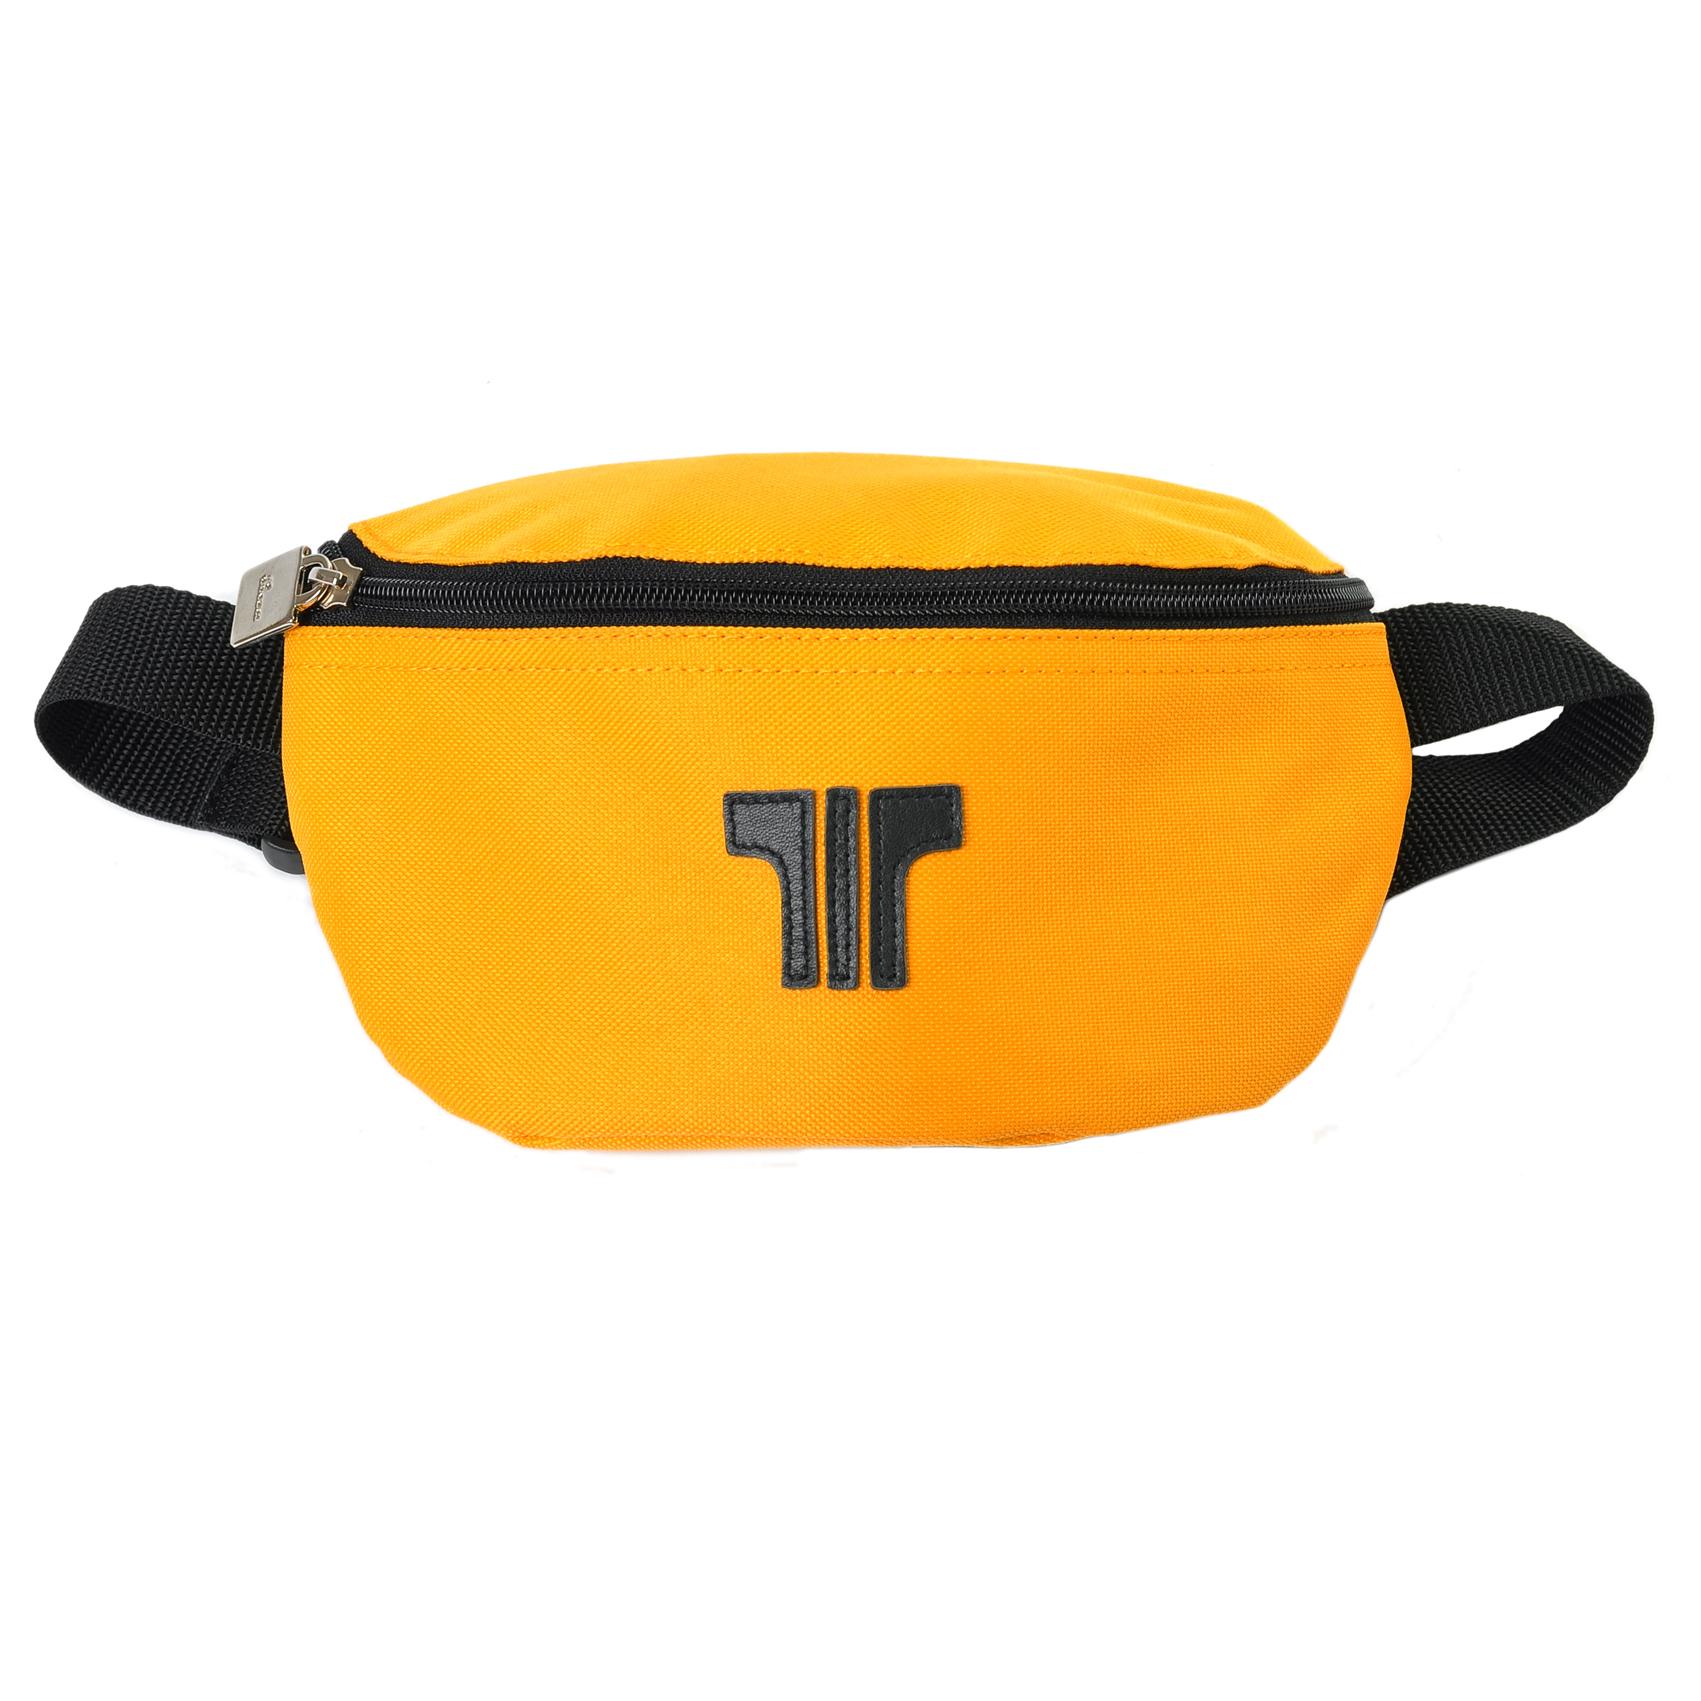 Tisza shoes - Belt pack - Yellow-black